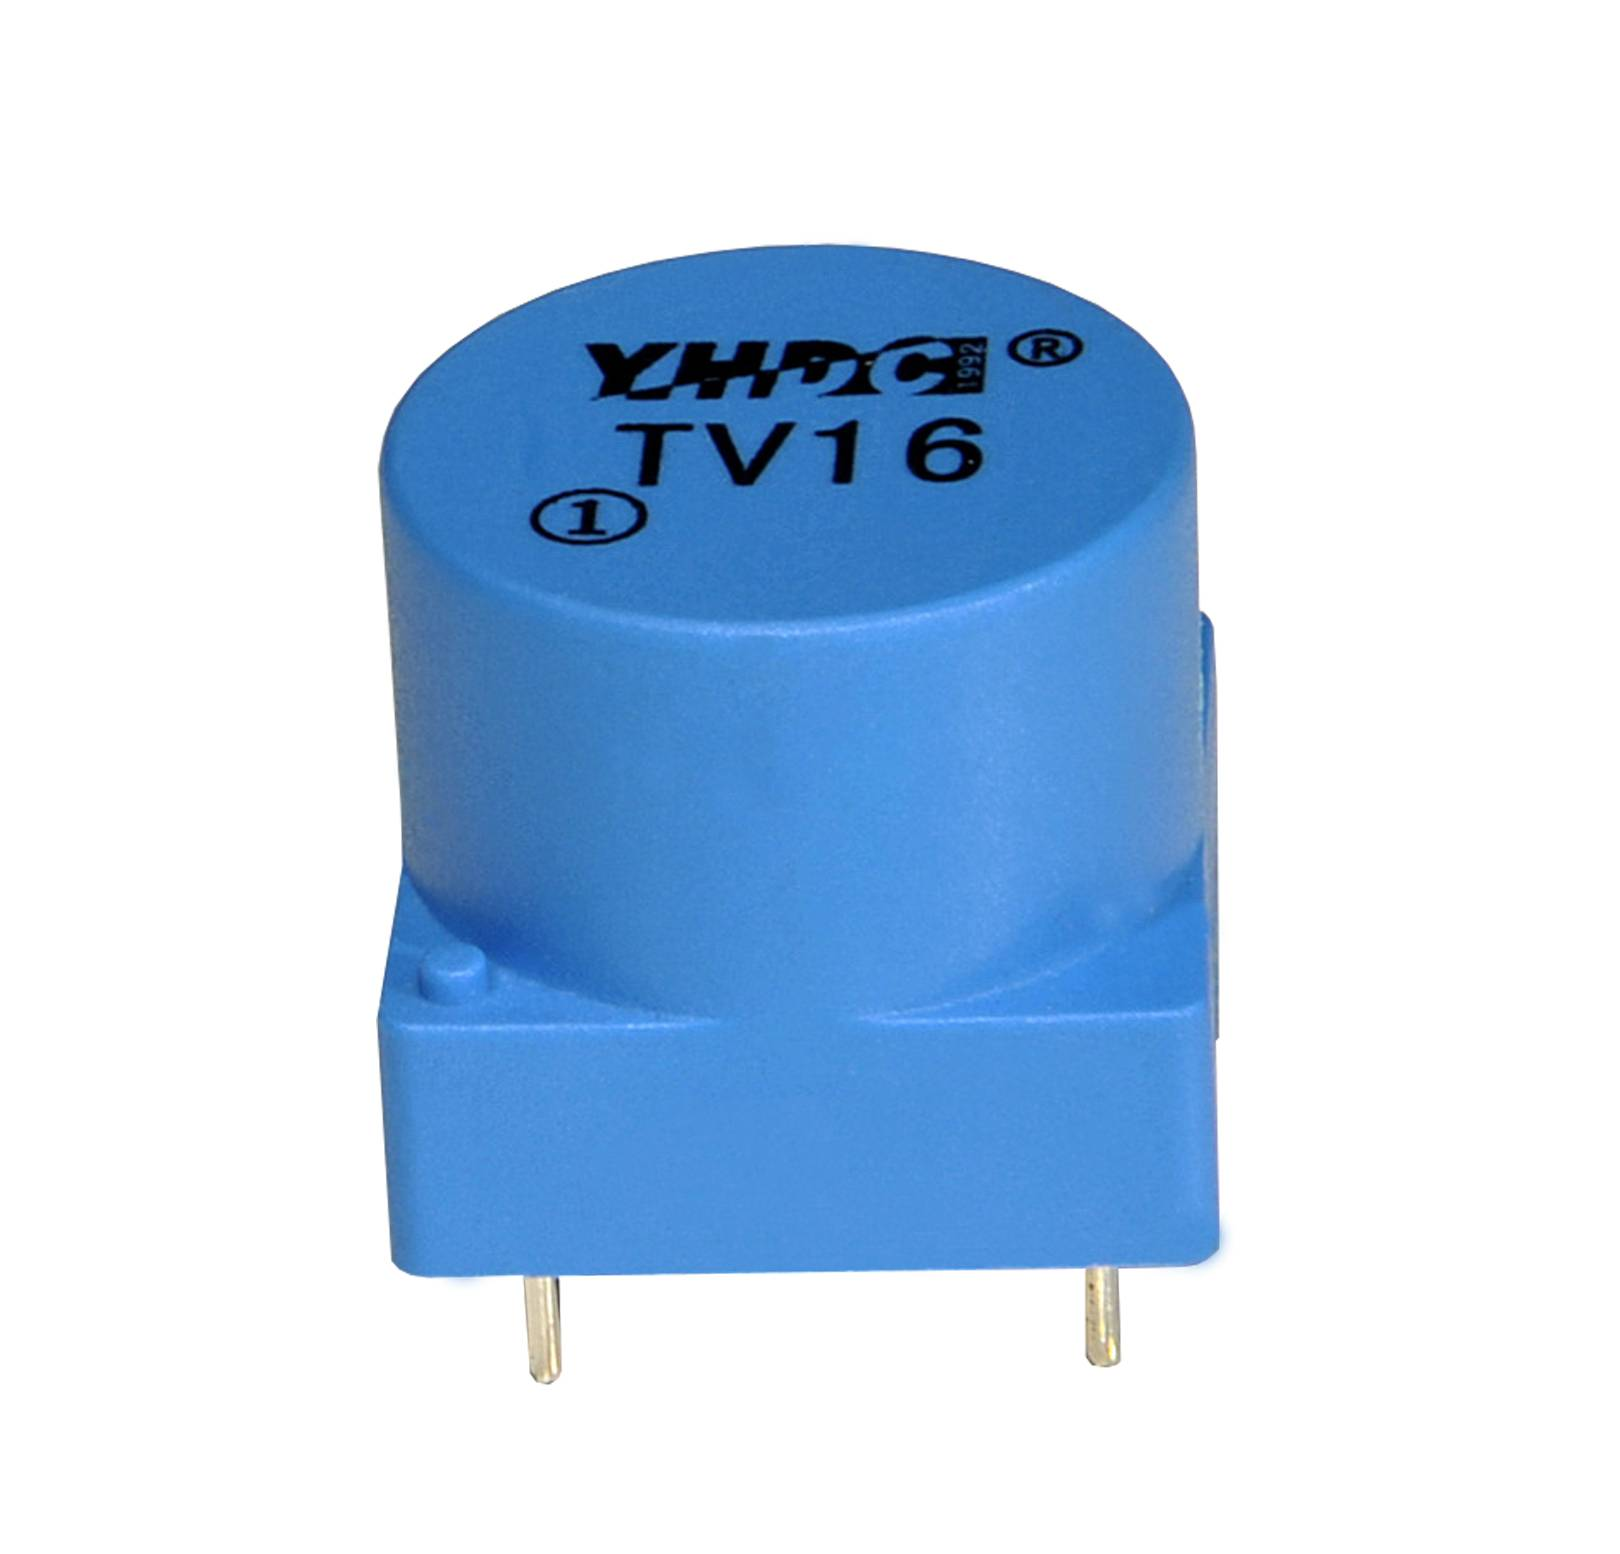 250V mini voltage transformer